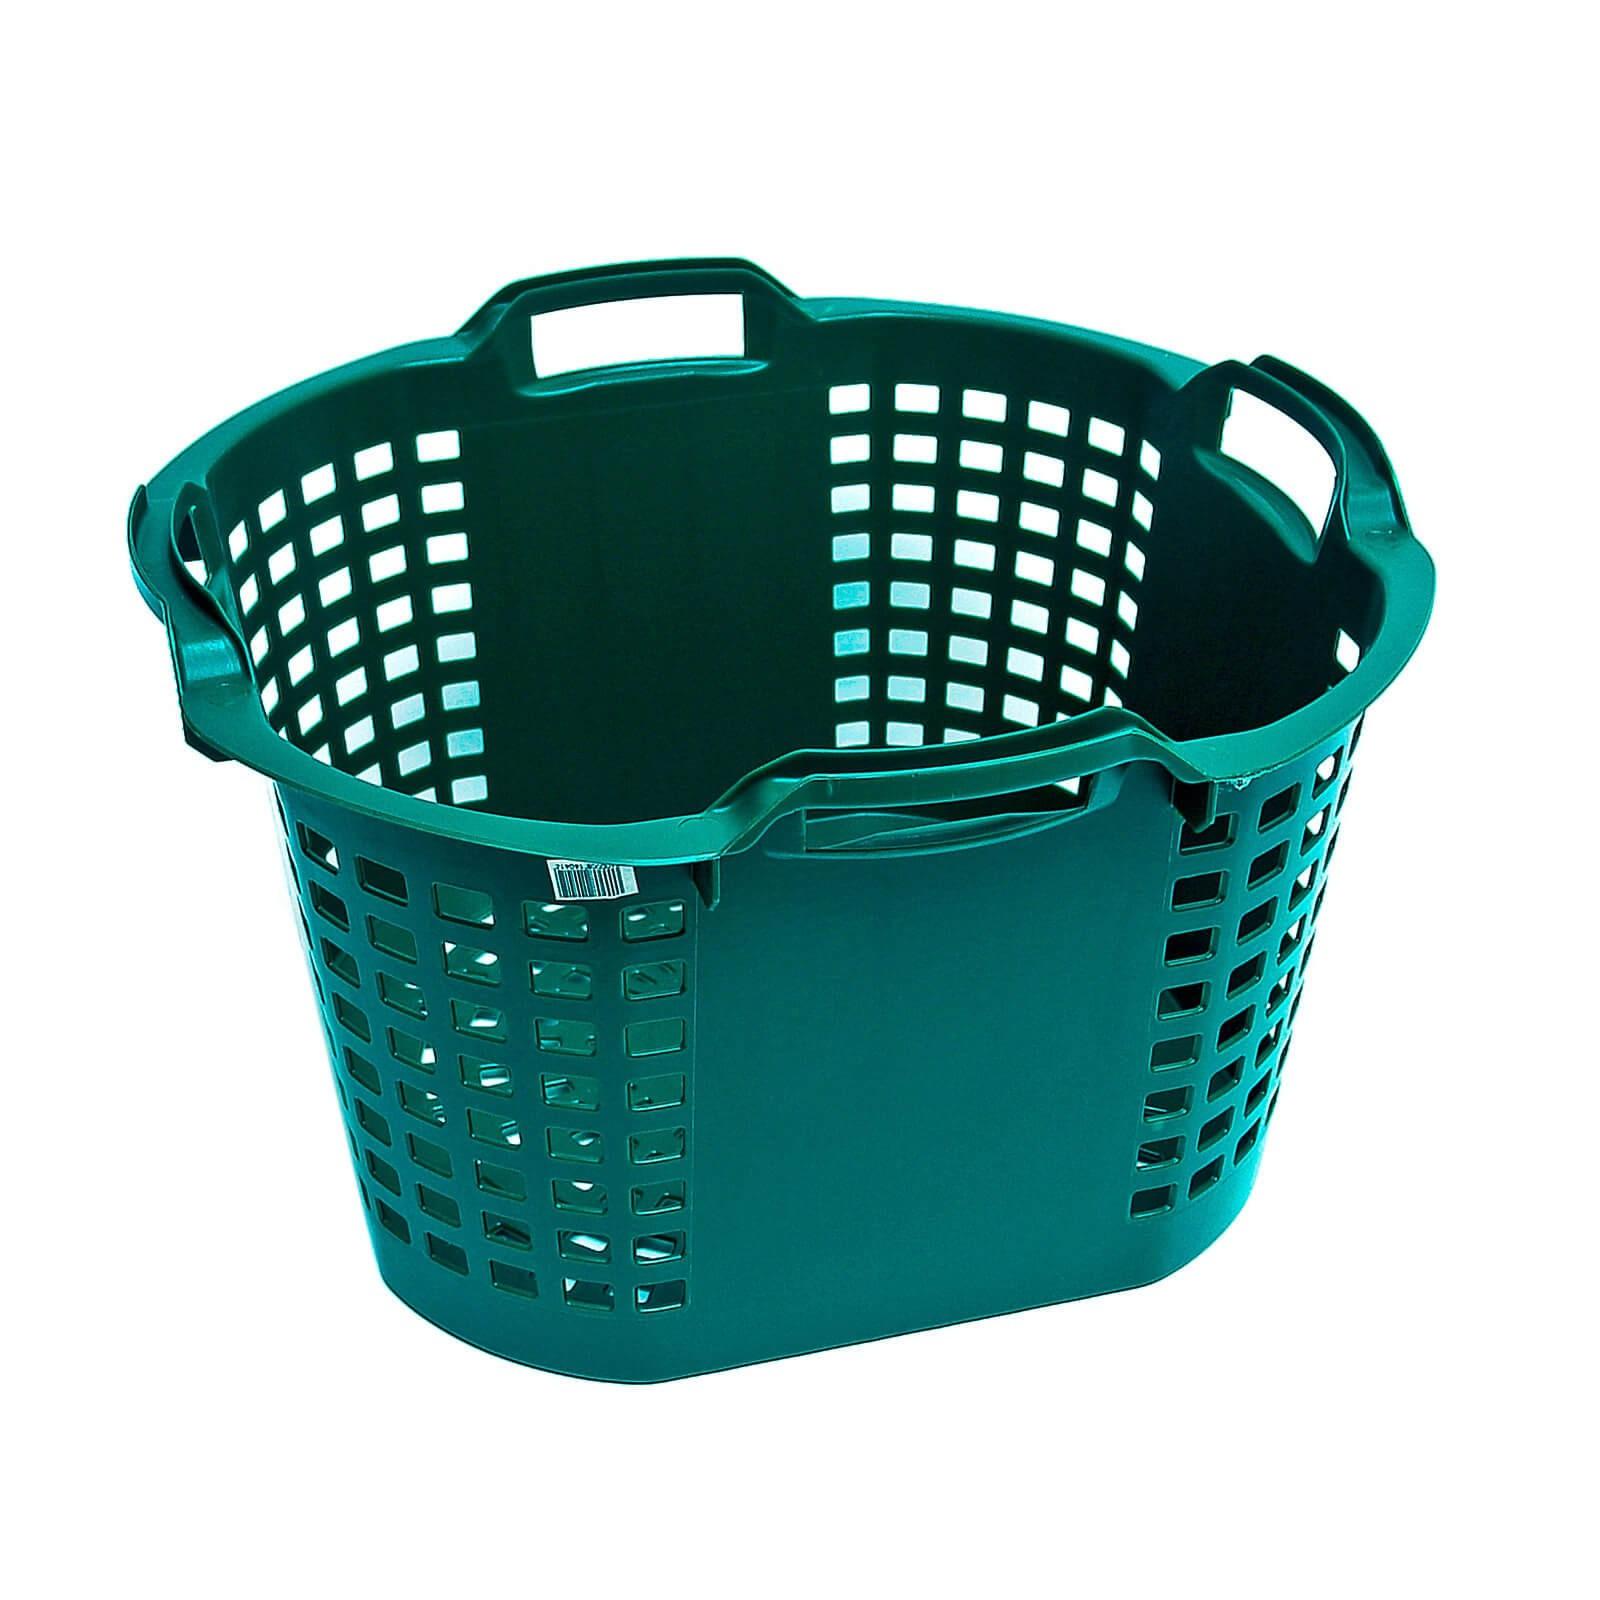 Multikorb Eimer flexibel Futtertrog Transporttrog Plastikkorb 25 Liter grün